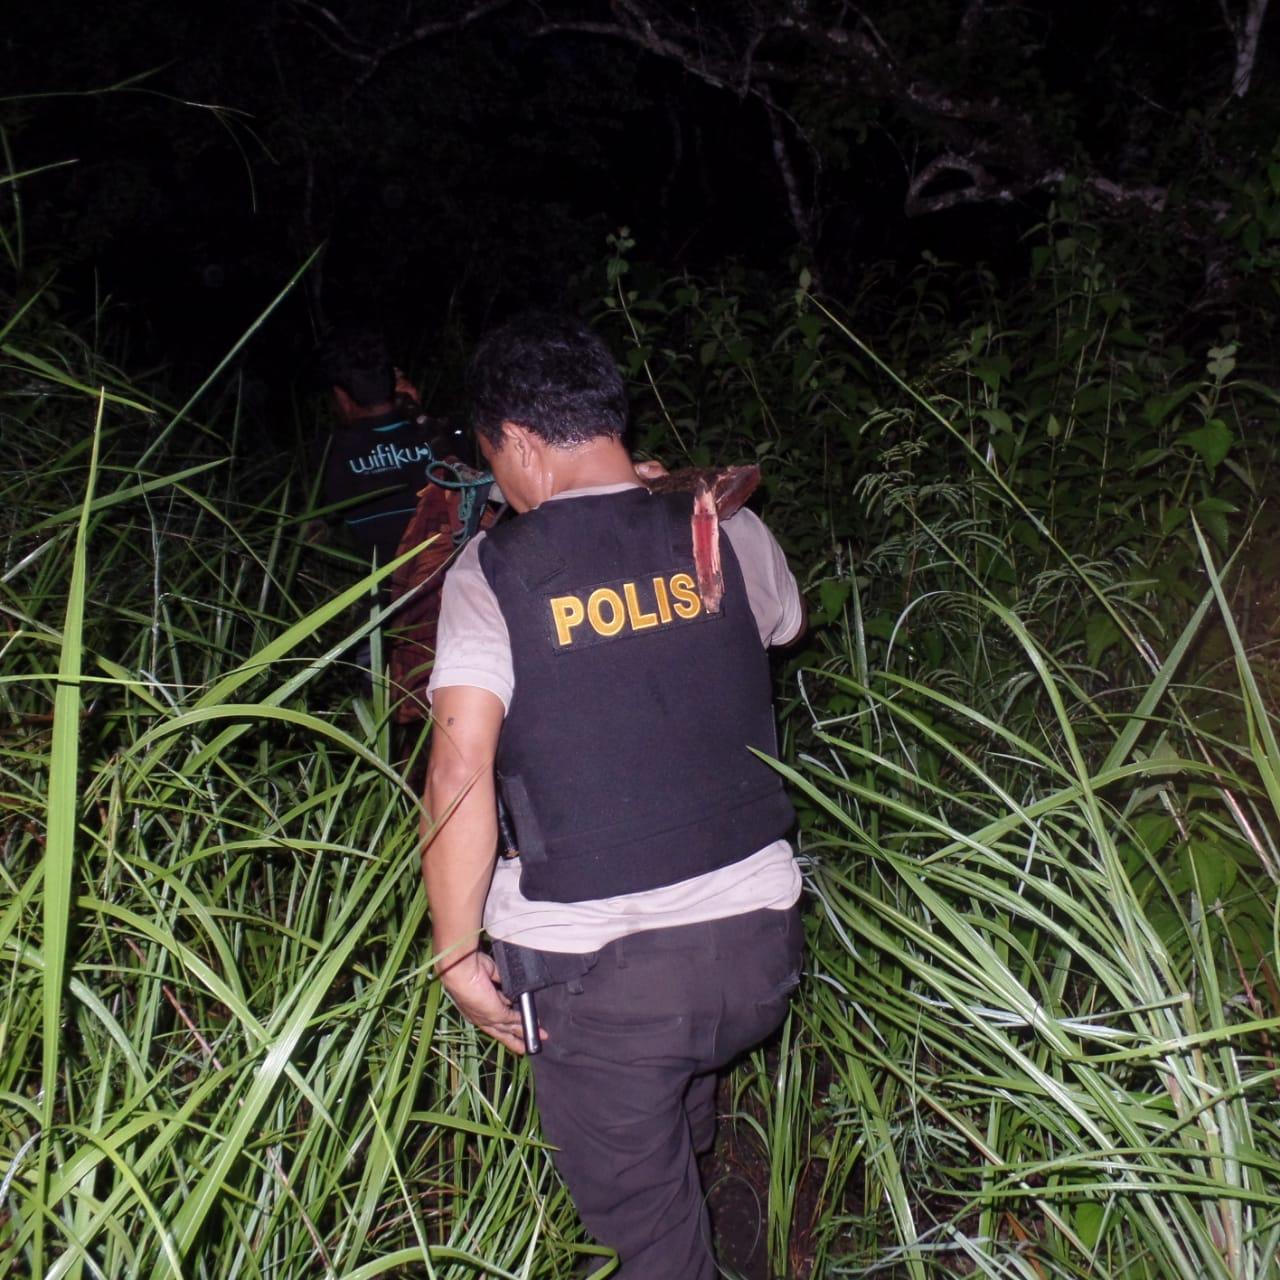 Polsek Umalulu Bantu Evakuasi Korban Terseret Banjir di Air Terjun Waimarang